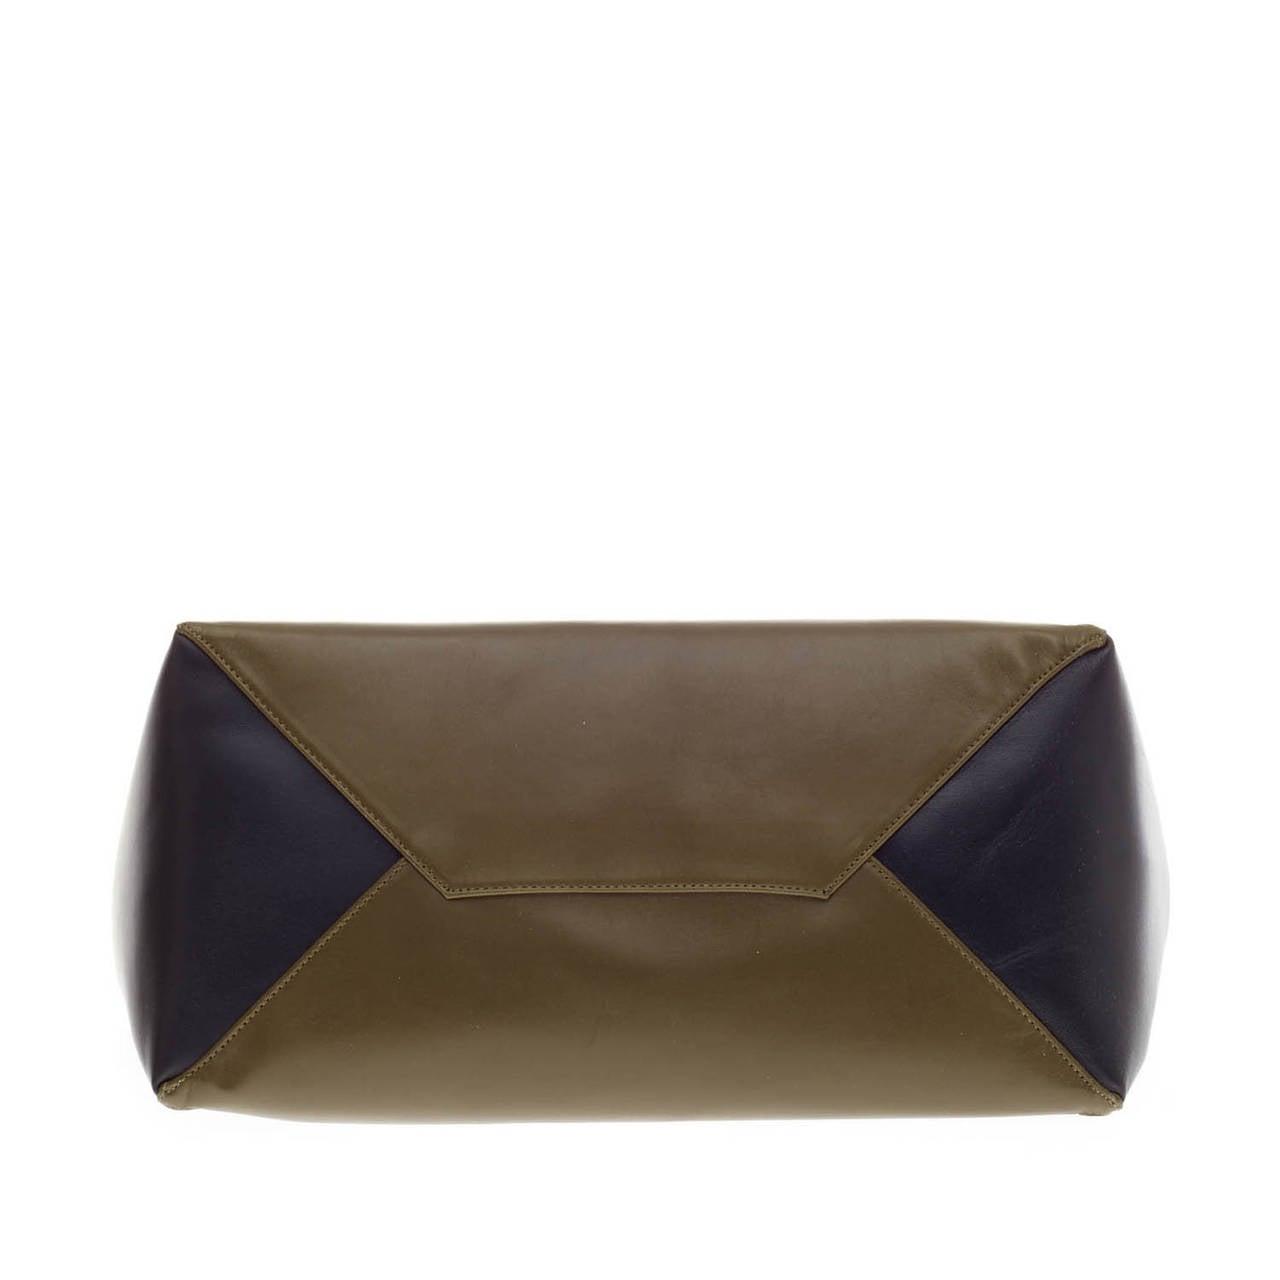 celine luggage mini black leather tote bag - Celine Gusset Cabas Leather Horizontal at 1stdibs